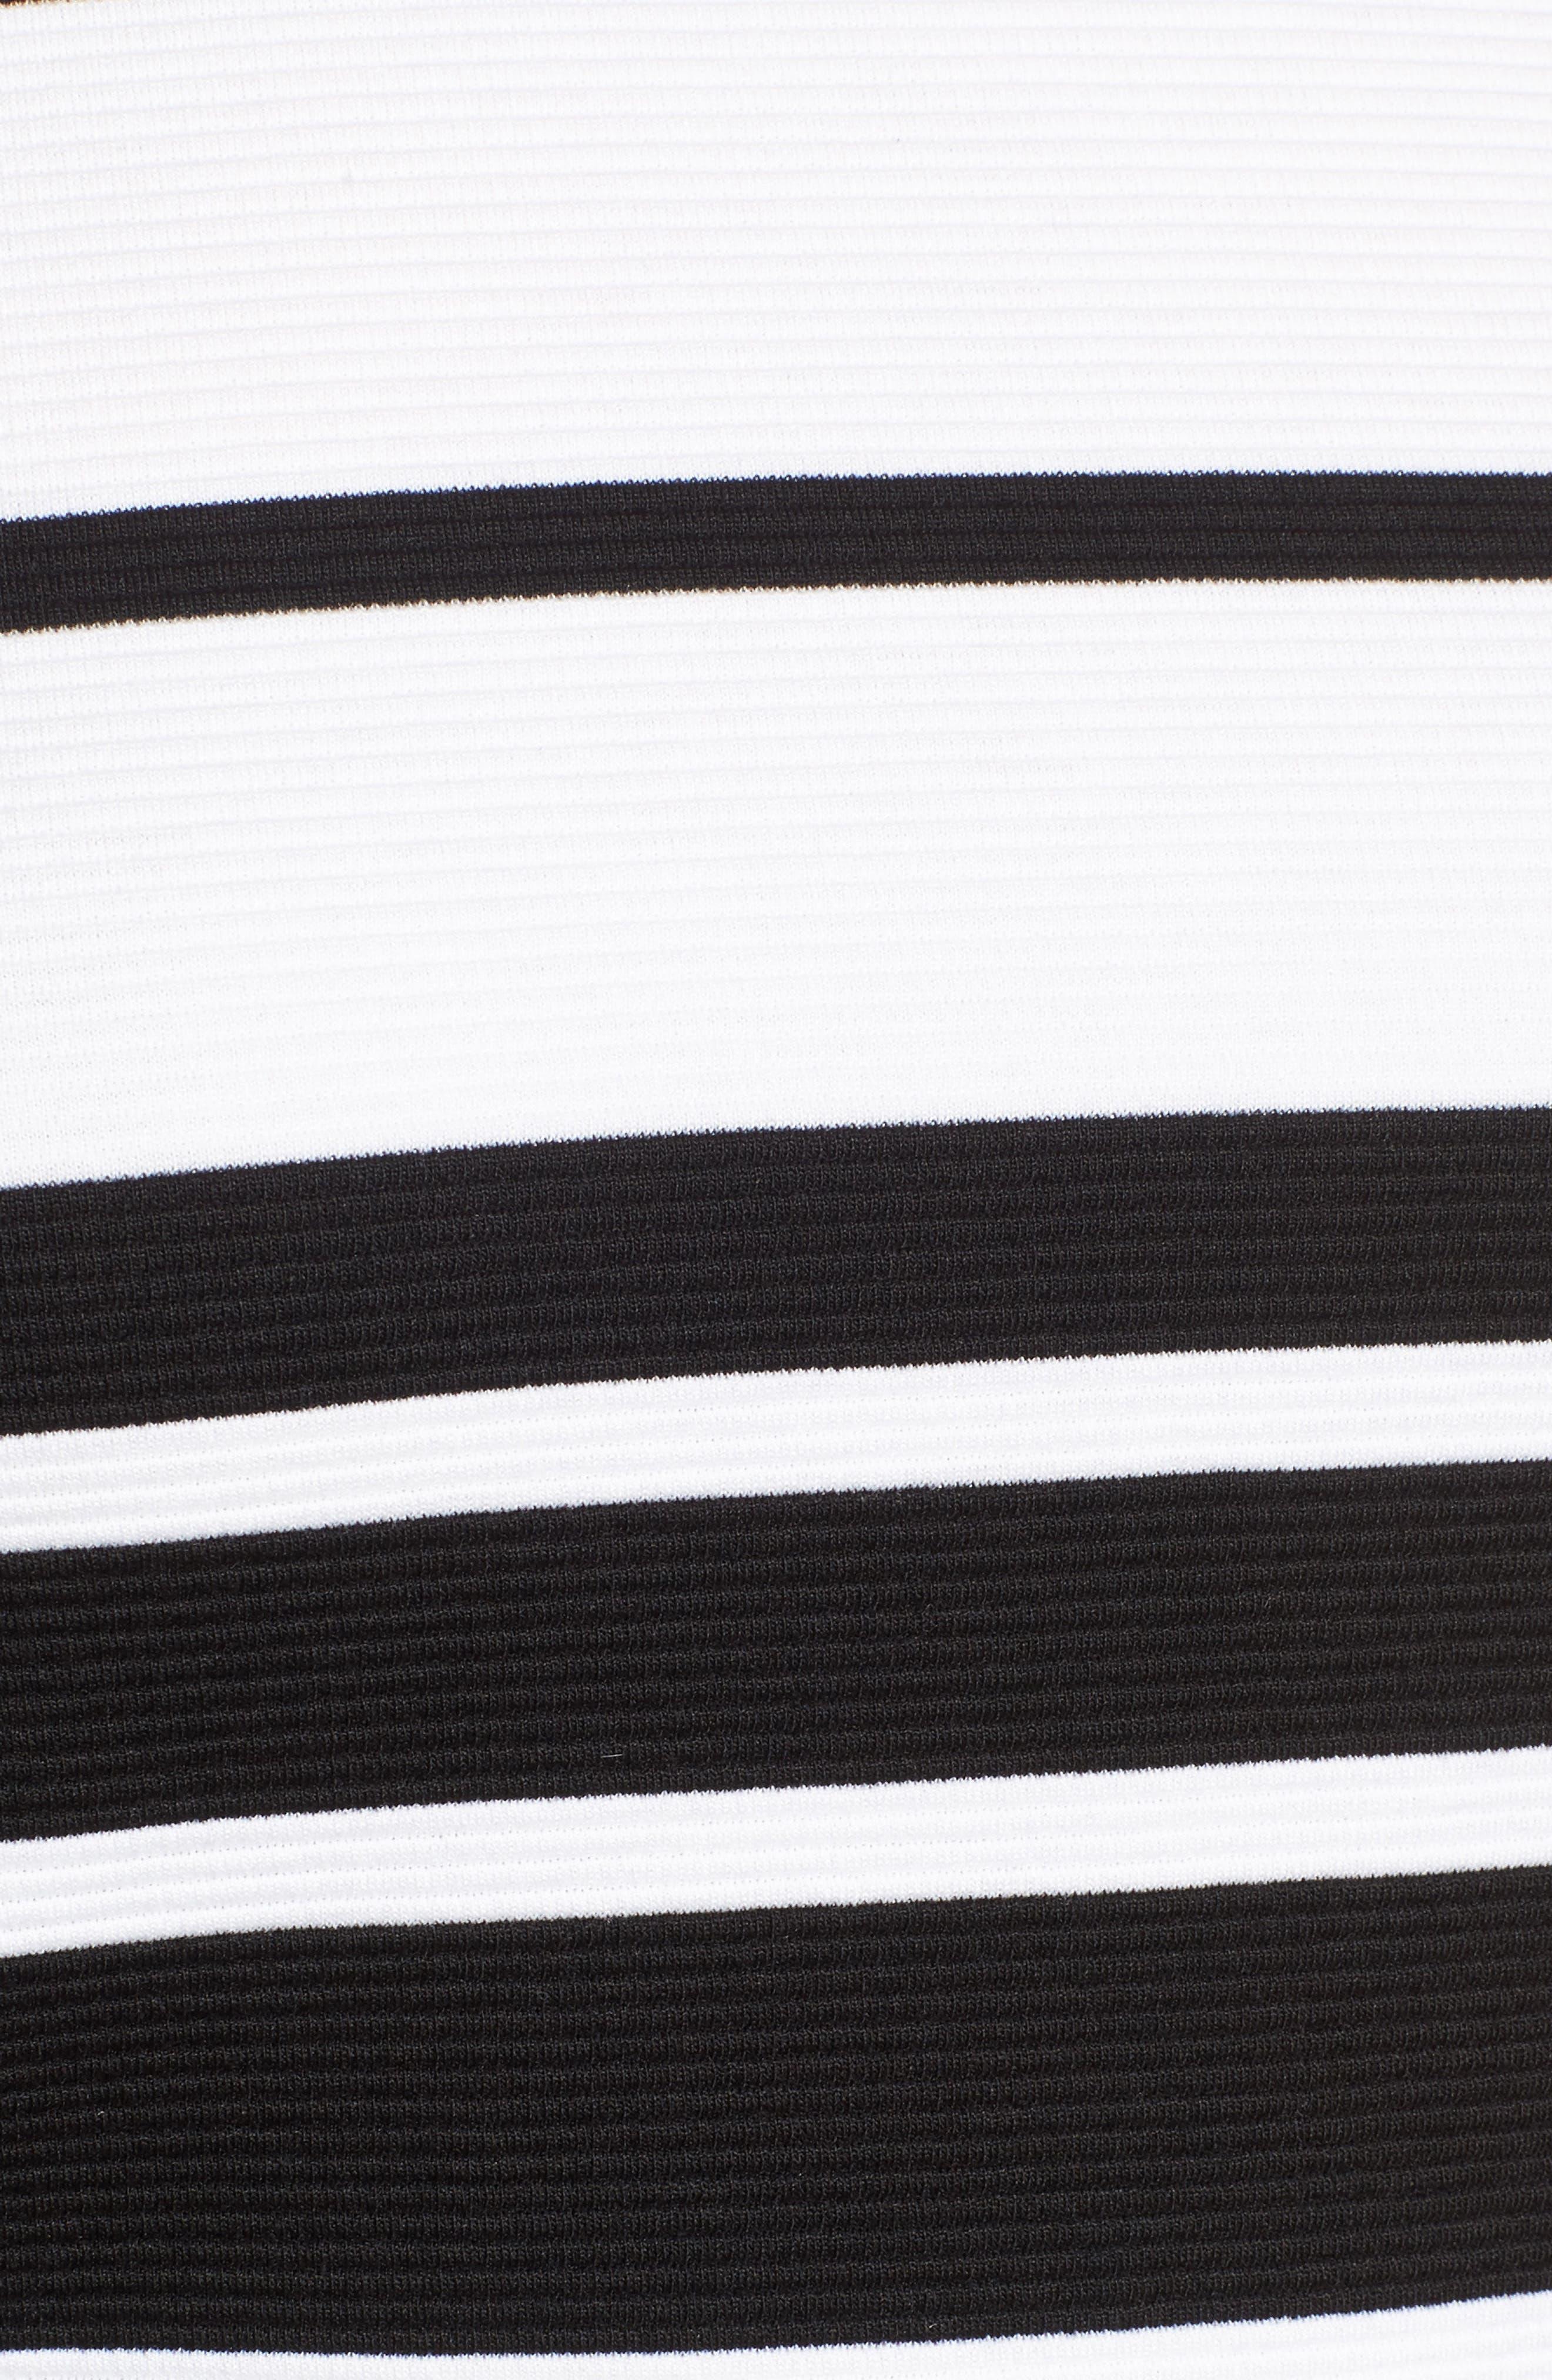 Stripe Ottoman Knit Peplum Top,                             Alternate thumbnail 5, color,                             Dark Peacock